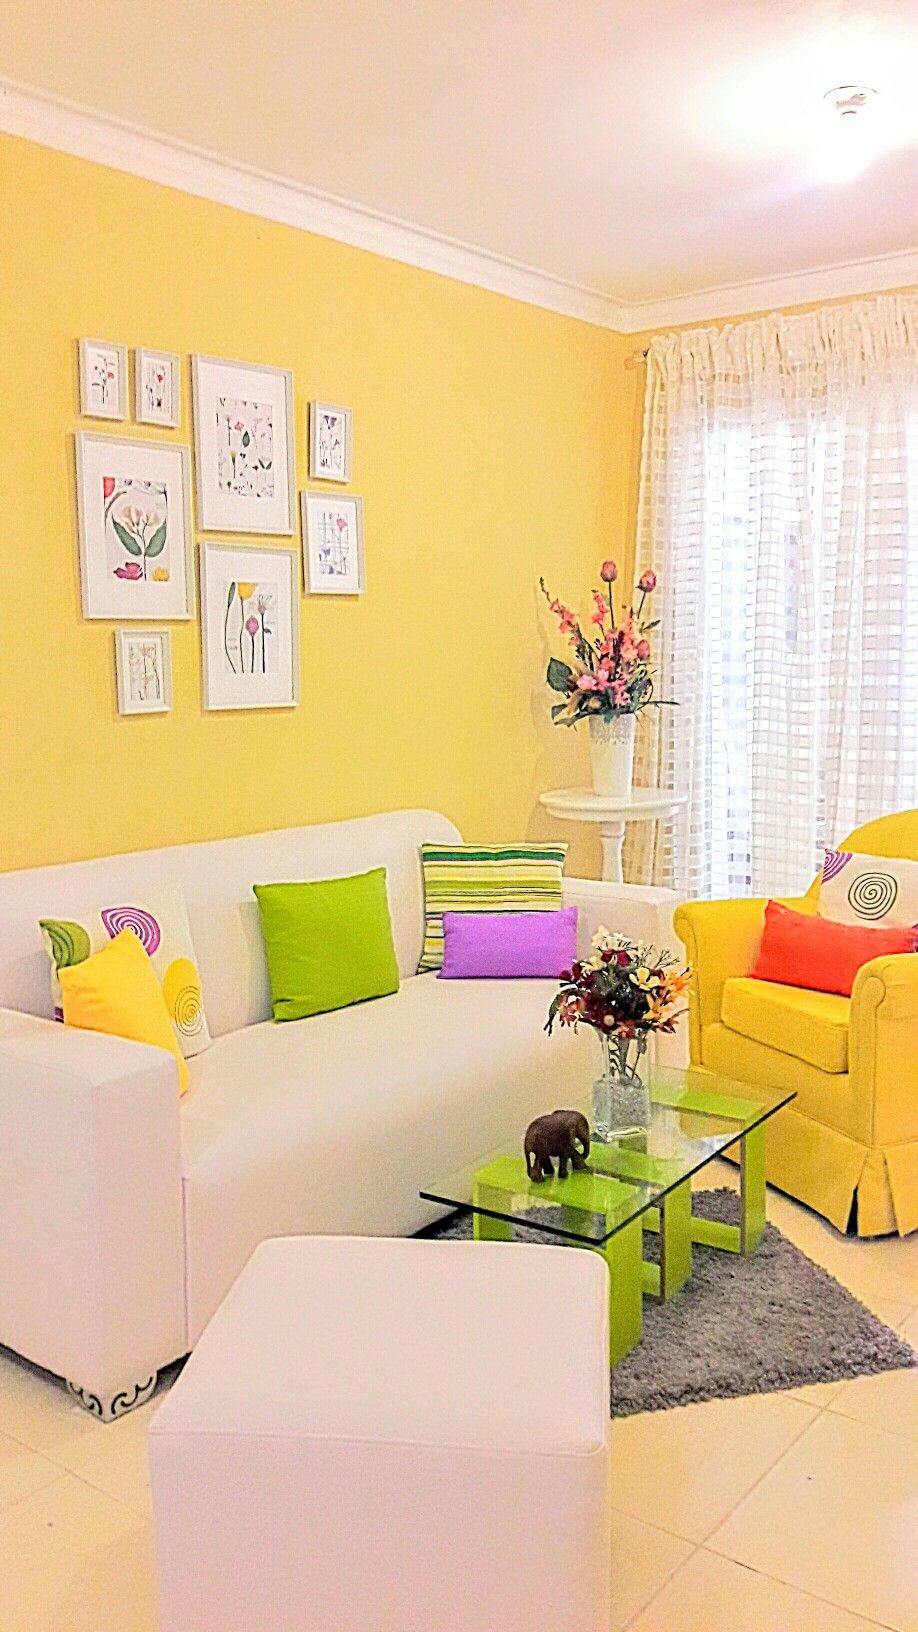 Mi Sensilla Sala Casas Pintadas Interior Colores De Casas Interiores Decoracion De Interiores